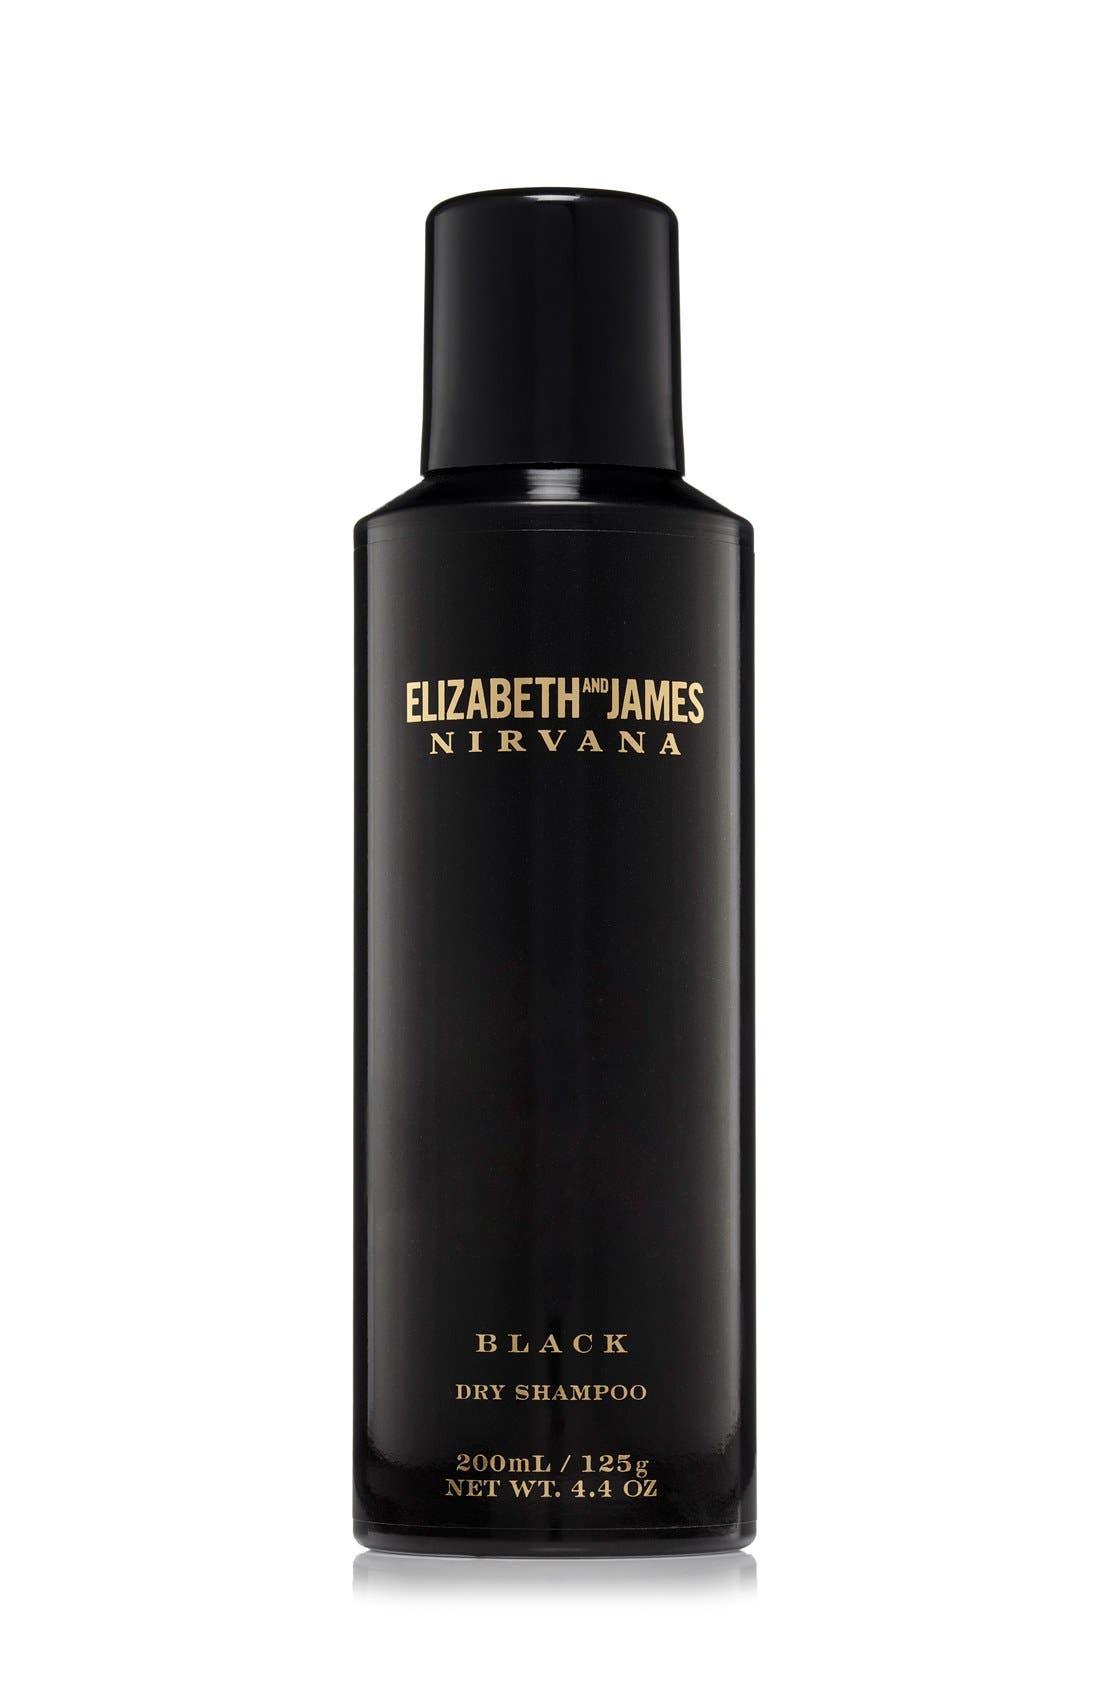 Elizabeth and James Nirvana Black Dry Shampoo